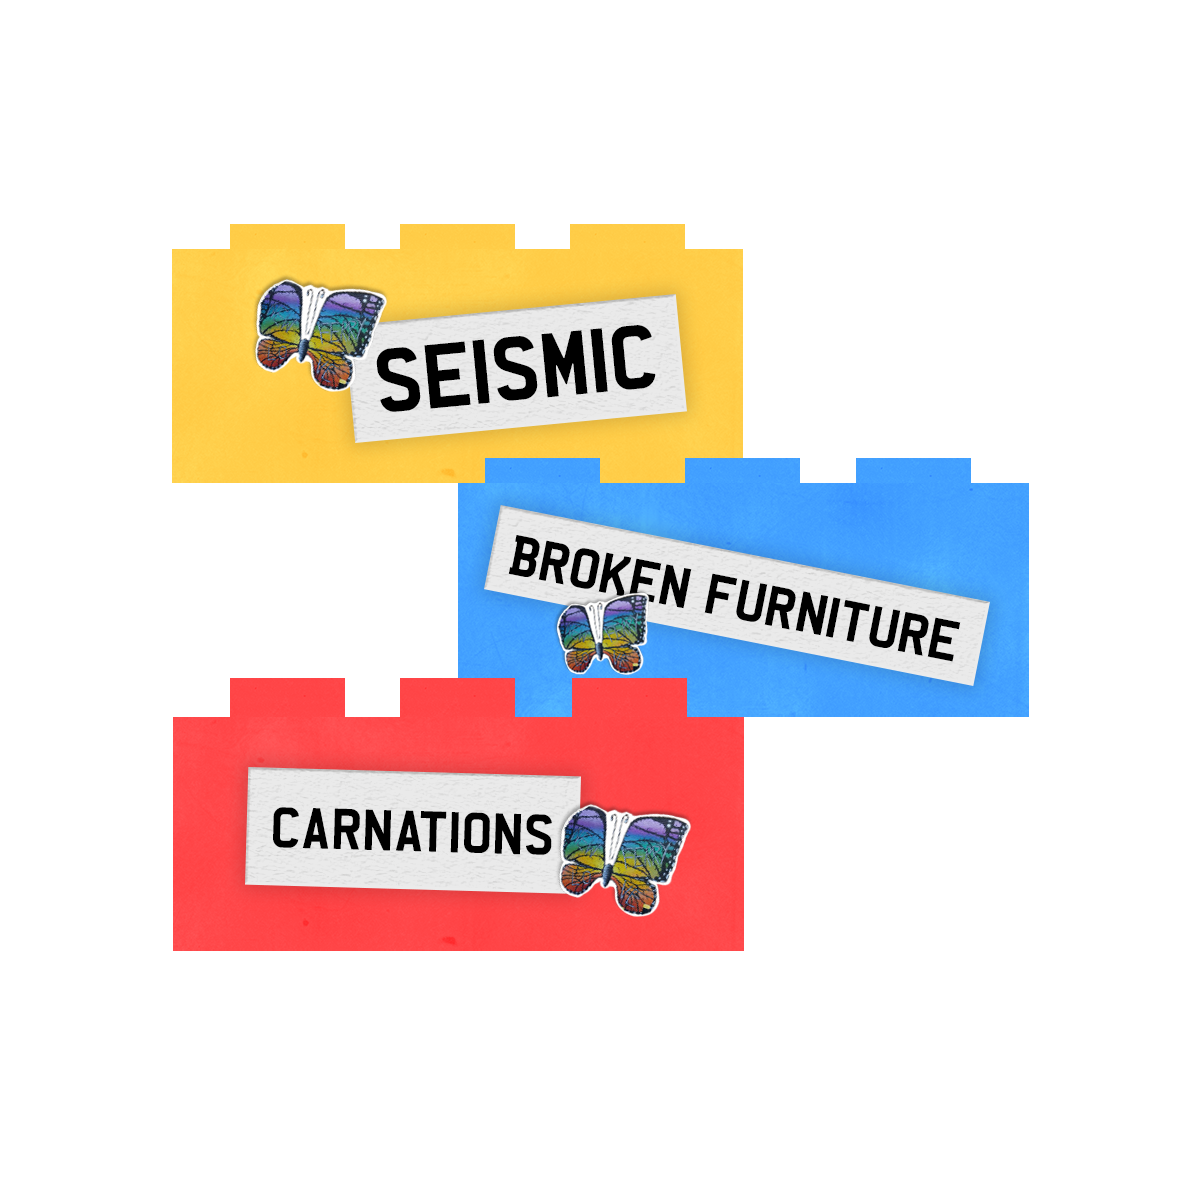 Seismic Broken Furniture Carnations